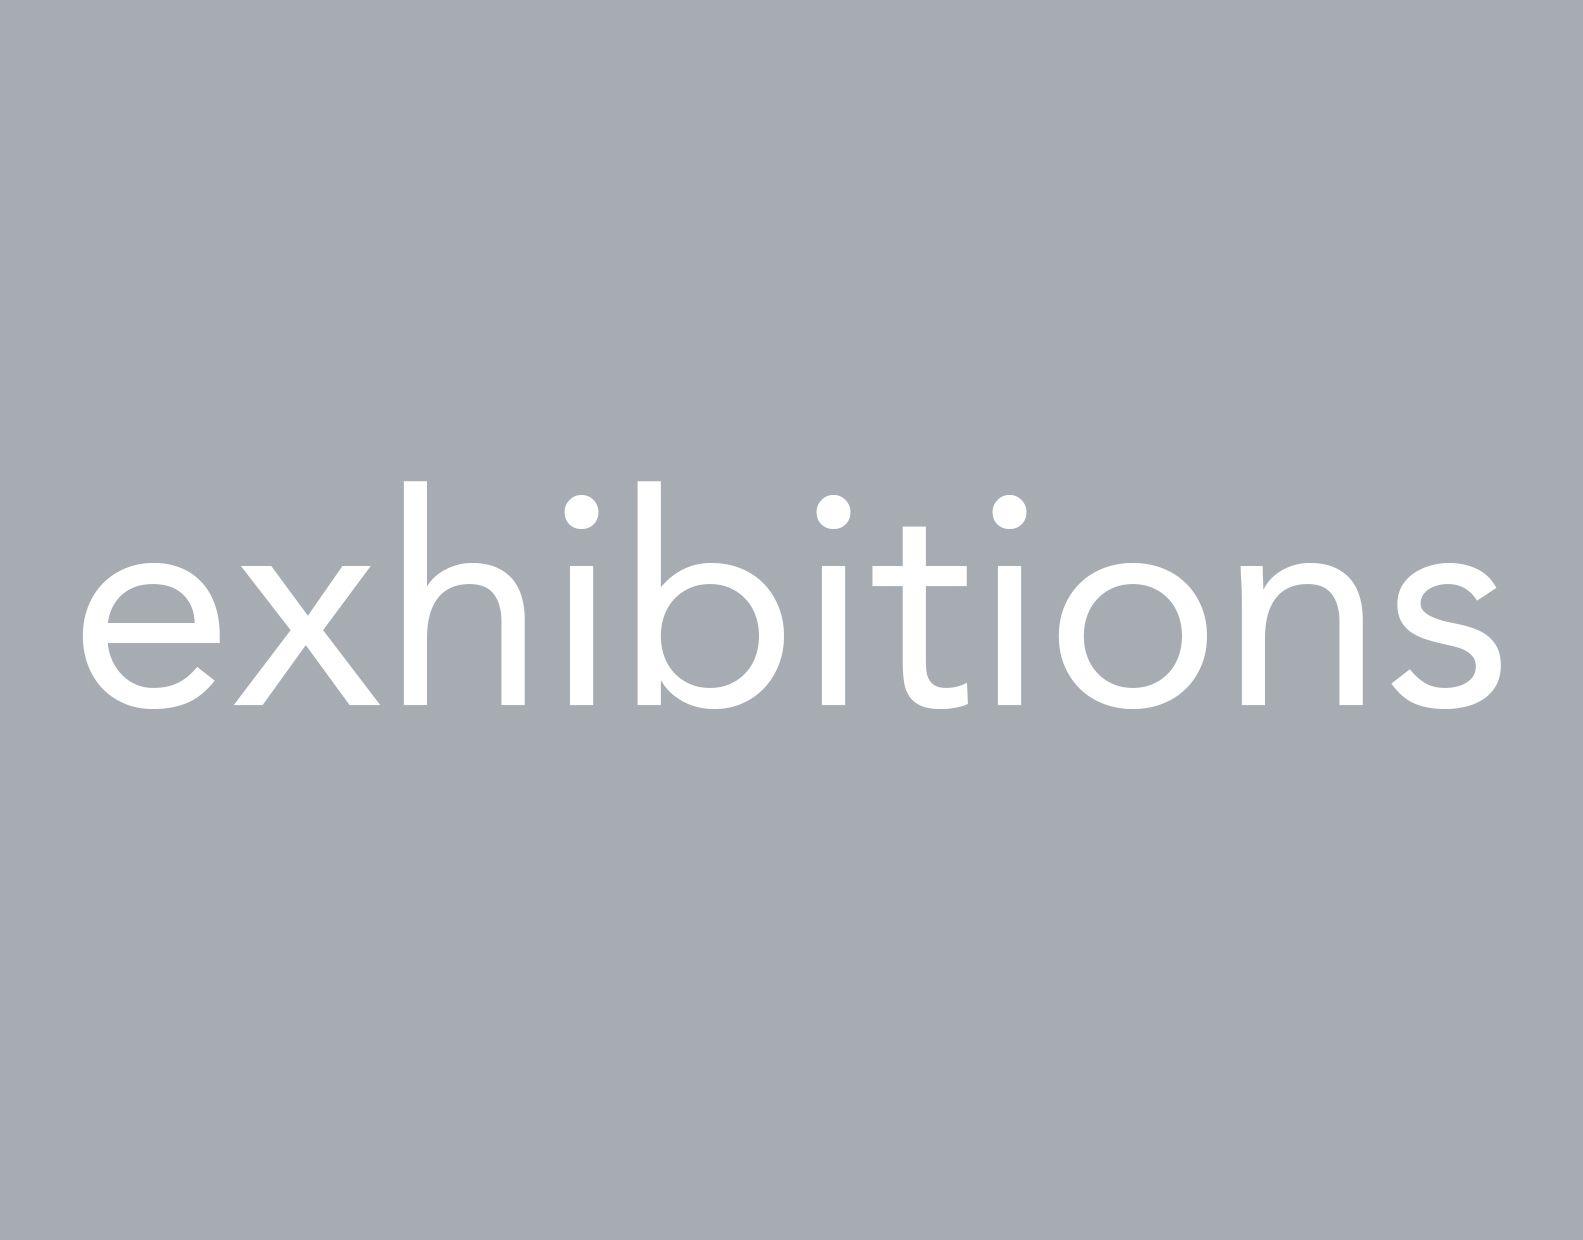 Portfolio exhibitions